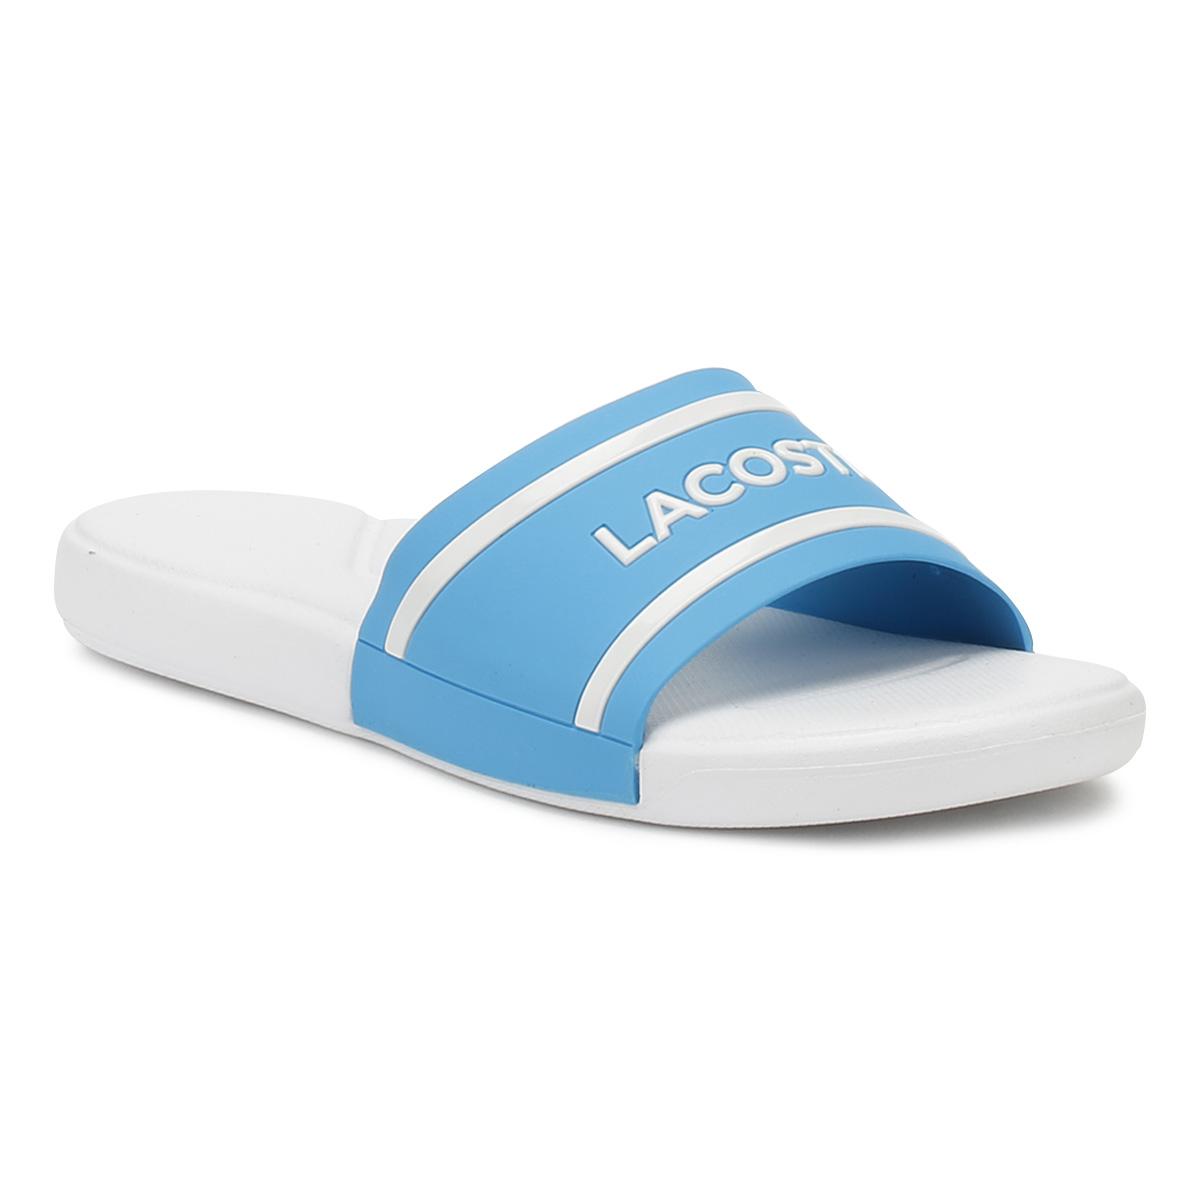 902917cf1 Lacoste Junior Blue   White L.30 118 2 Slides Kids Casual Summer ...